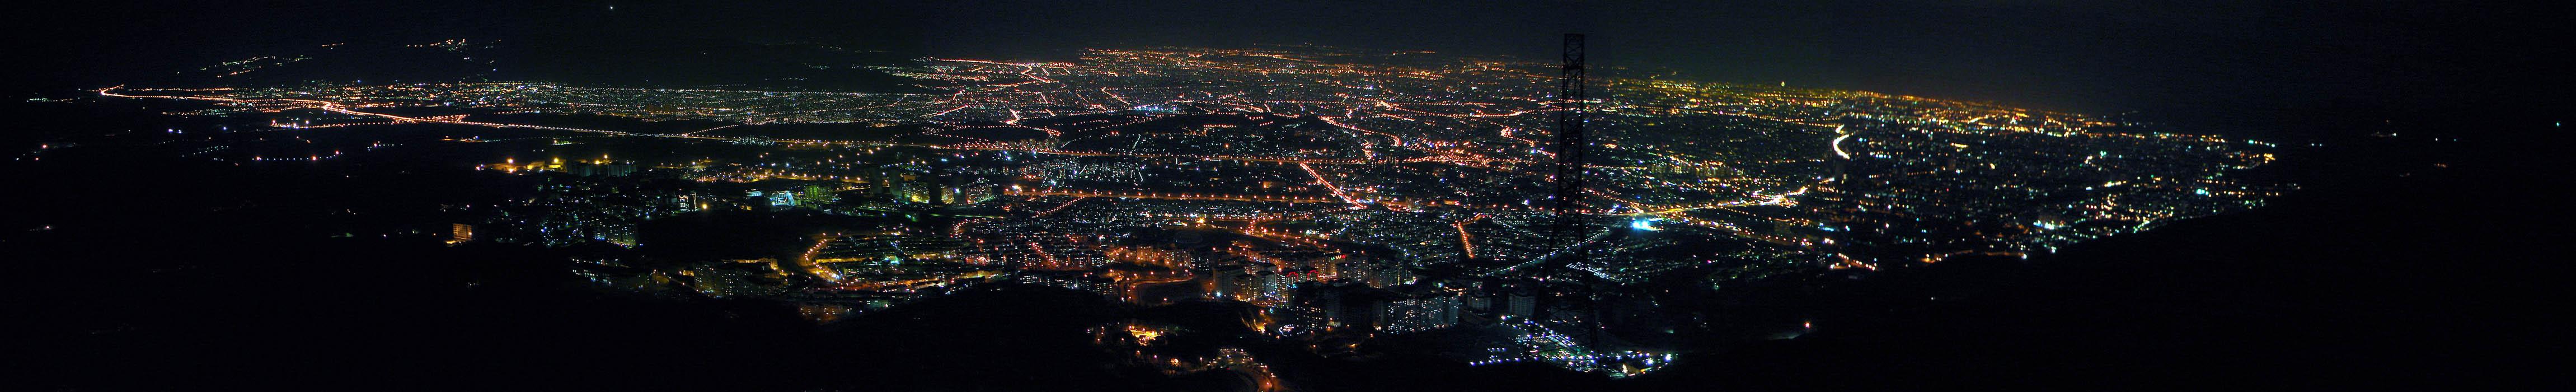 Tehran_Night_Panorama